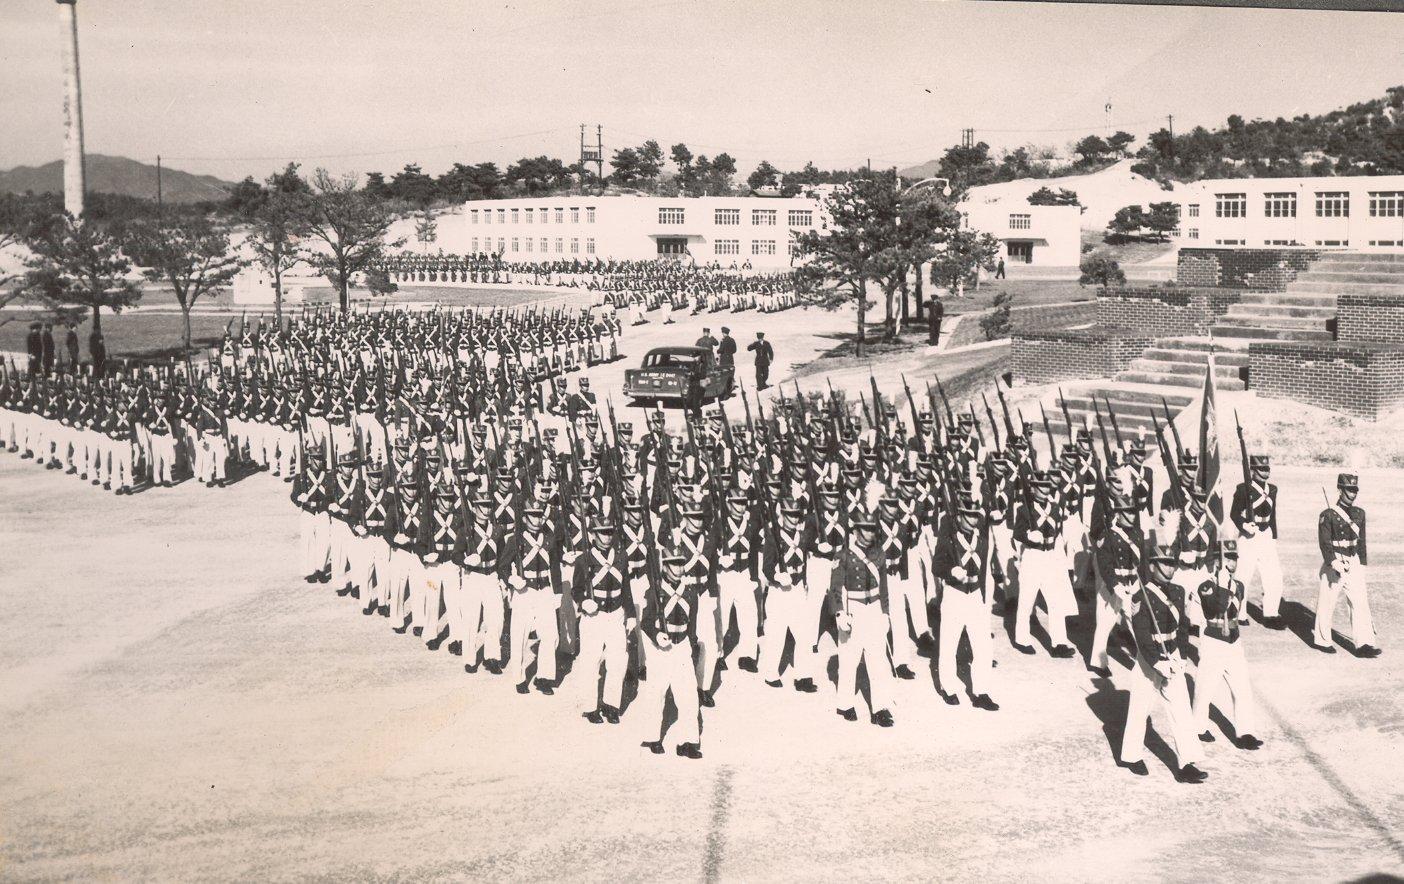 (1958-59) 2 KMA